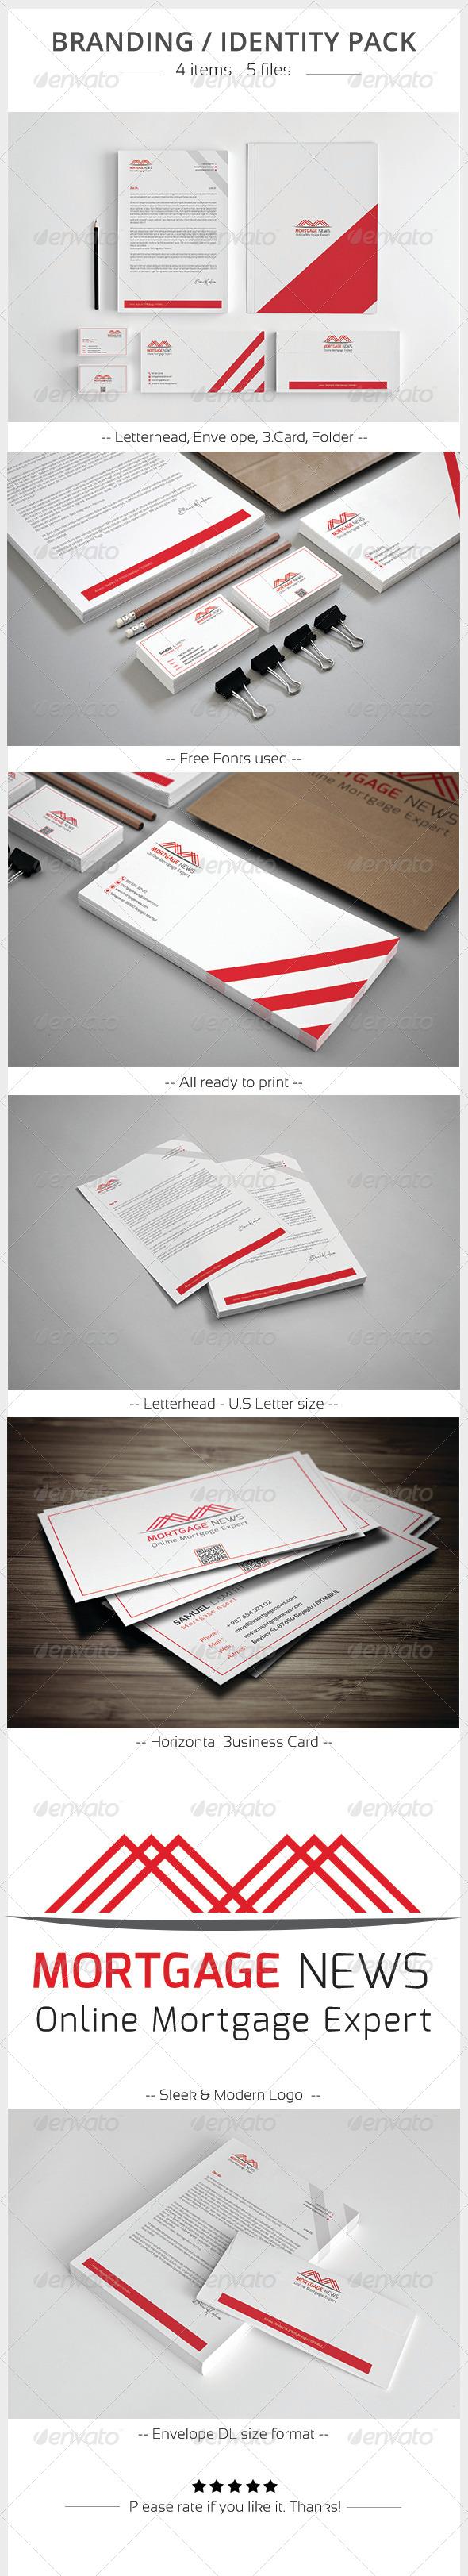 Mortgage News Corporate Identity - Stationery Print Templates